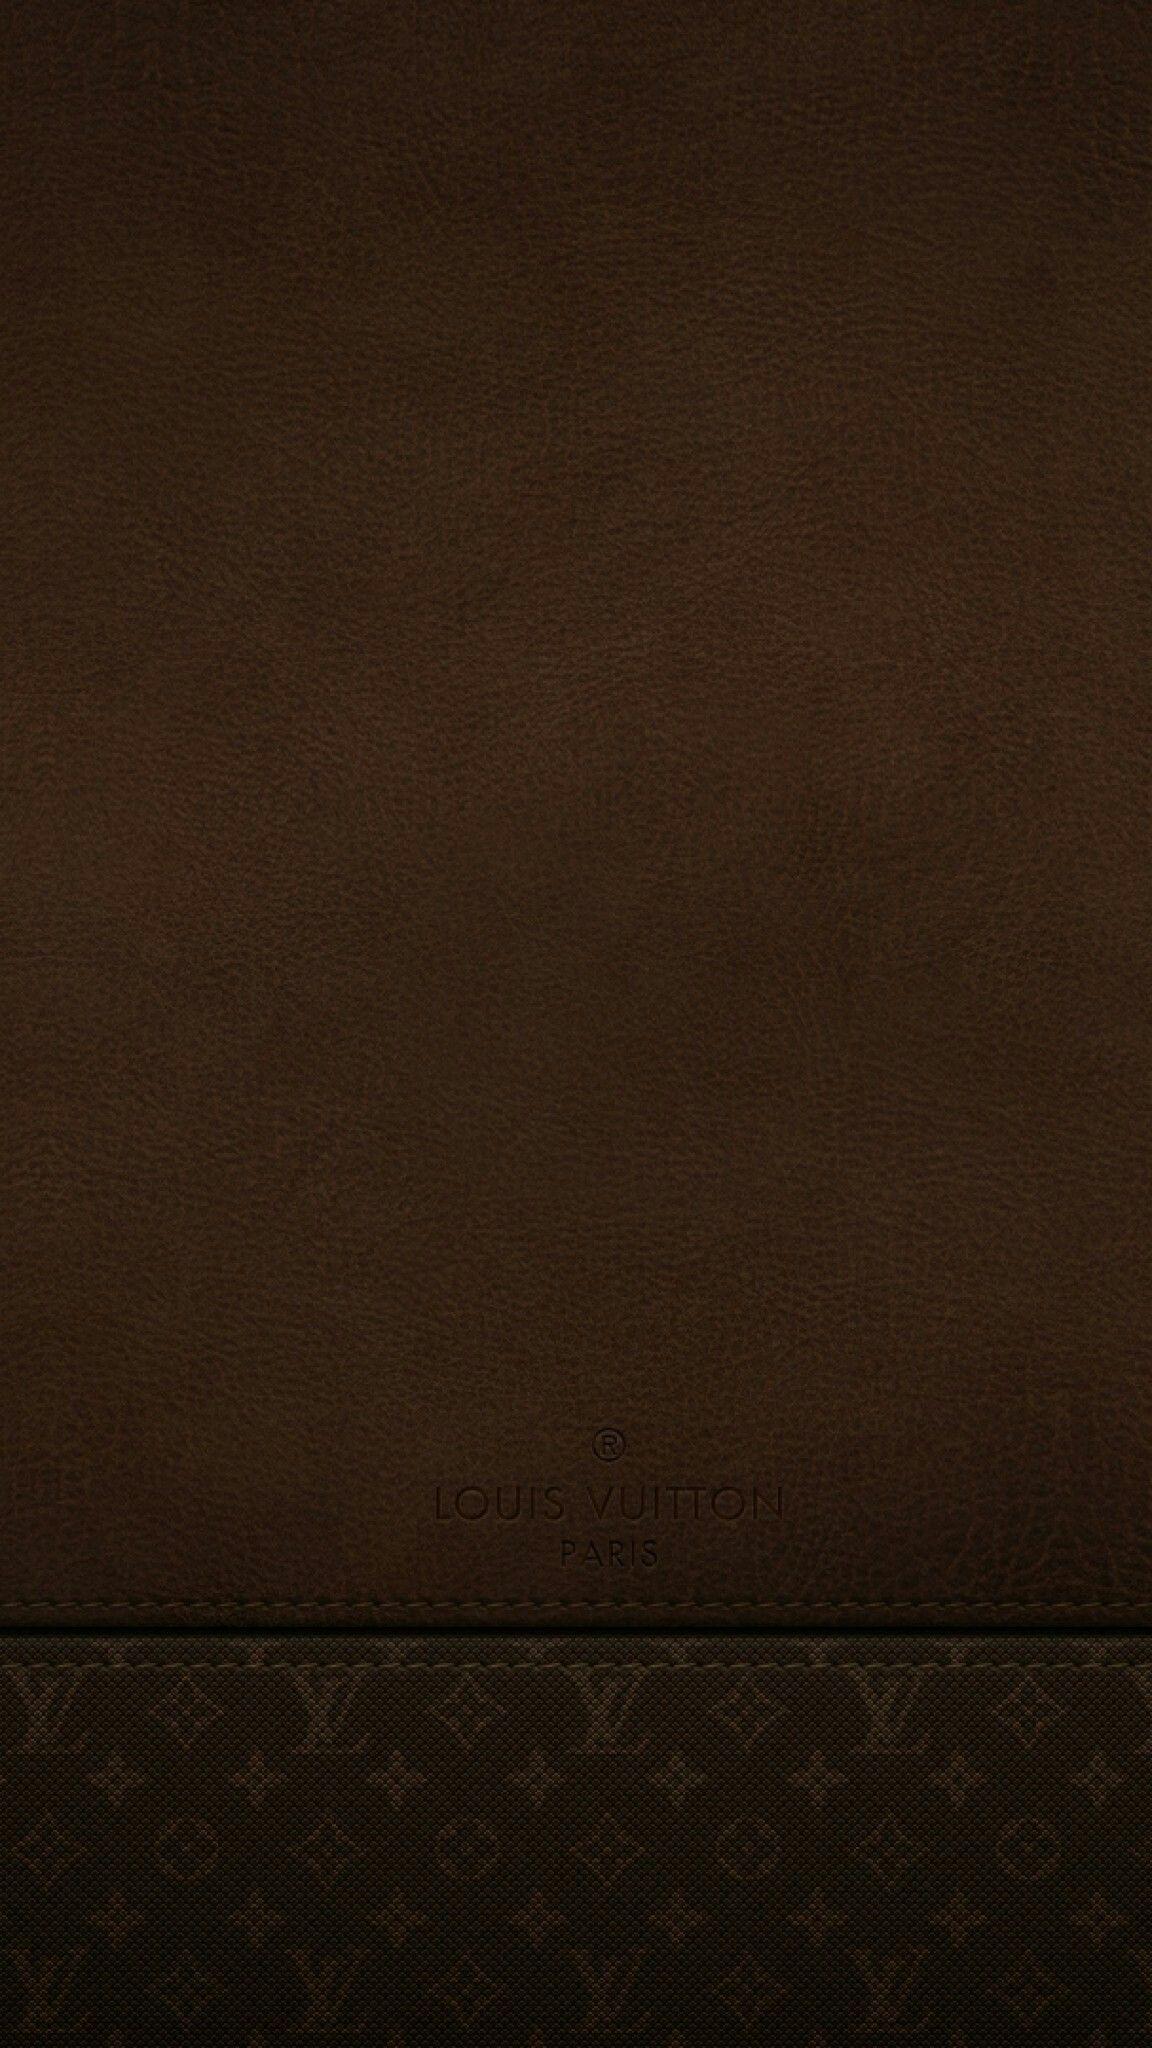 Brown Leather Louis Vuitton Wallpaper Light leak